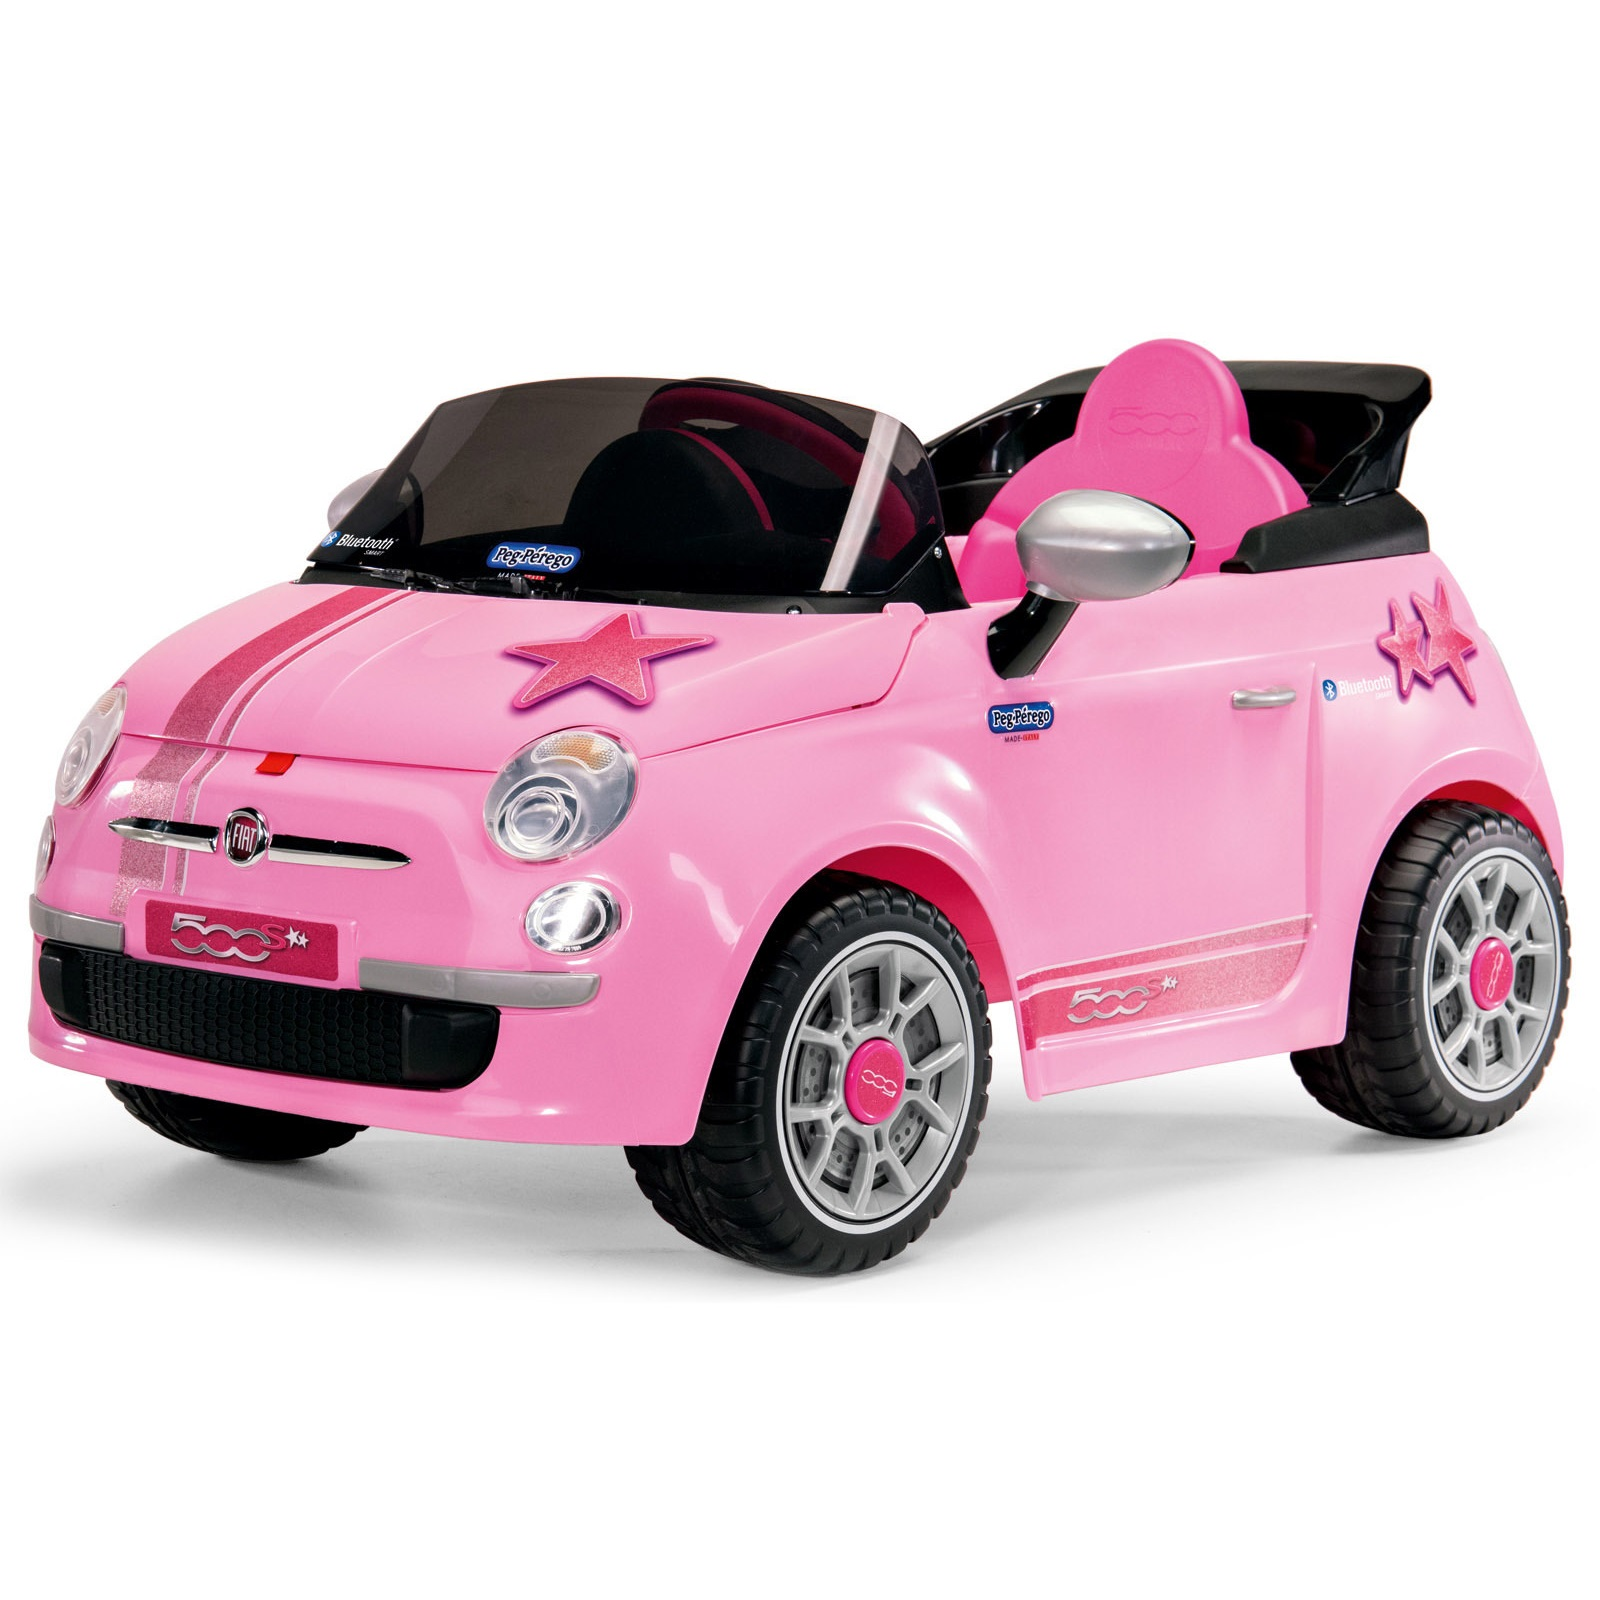 Детский электромобиль Fiat 500 Star Pink R/C, цвет – розовыйЭлектромобили, детские машины на аккумуляторе<br>Детский электромобиль Fiat 500 Star Pink R/C, цвет – розовый<br>